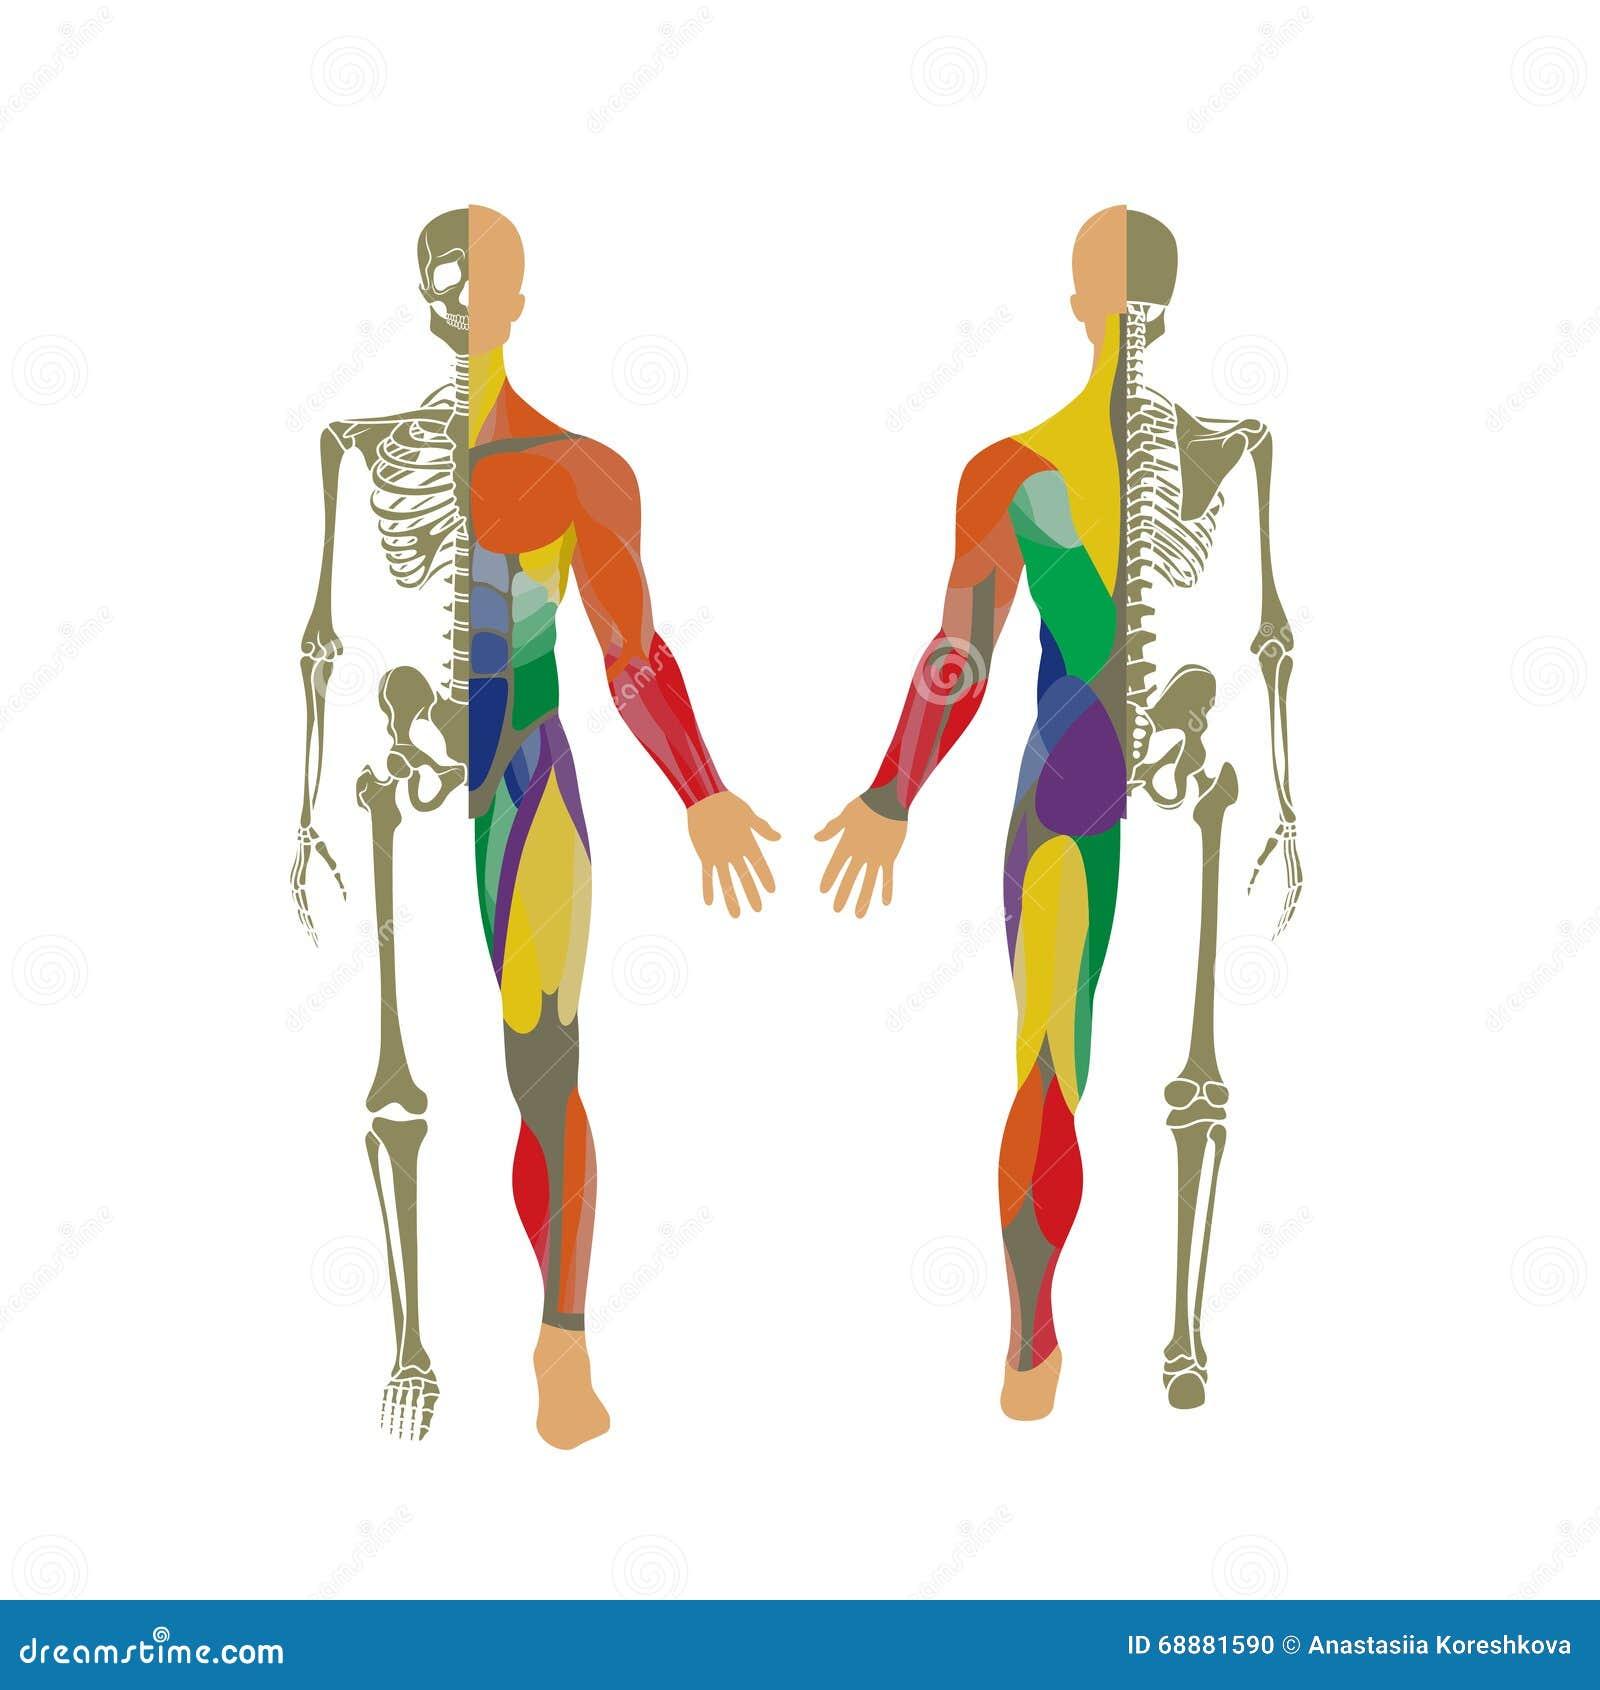 Magnífico Sistema Muscular Fotos Etiquetadas Inspiración - Imágenes ...